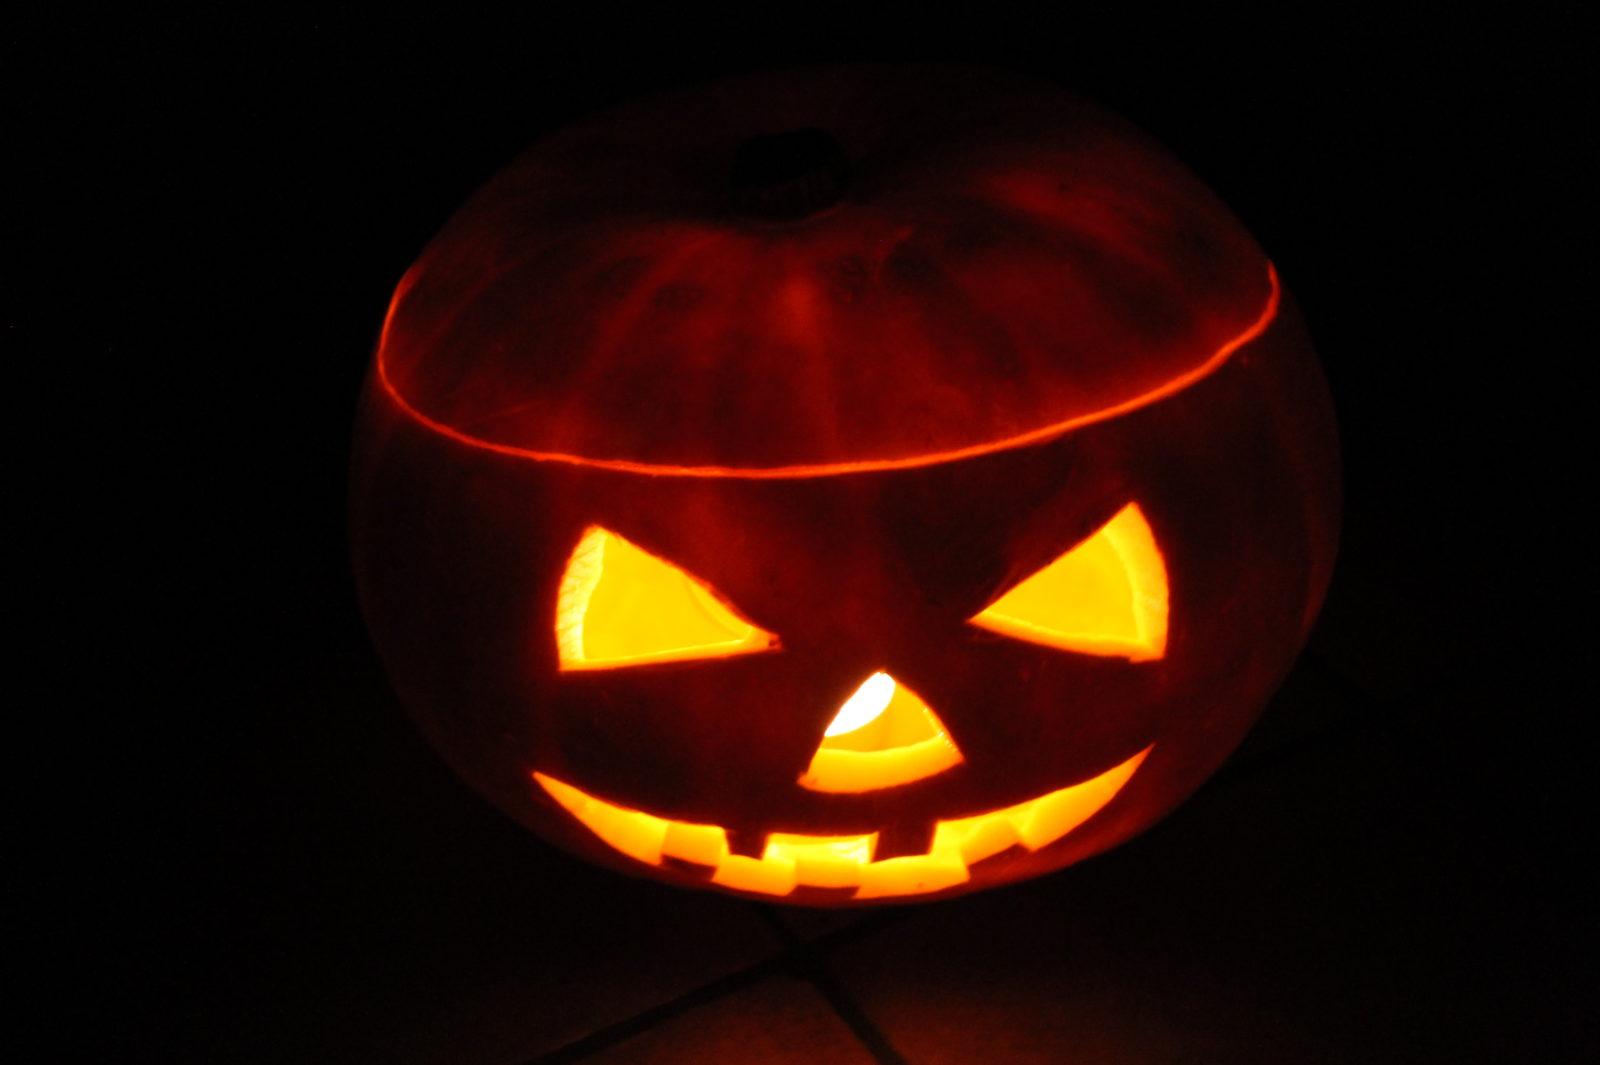 Halloween 30 Oktober.366 30 Oktober 2016 Halloween Witch